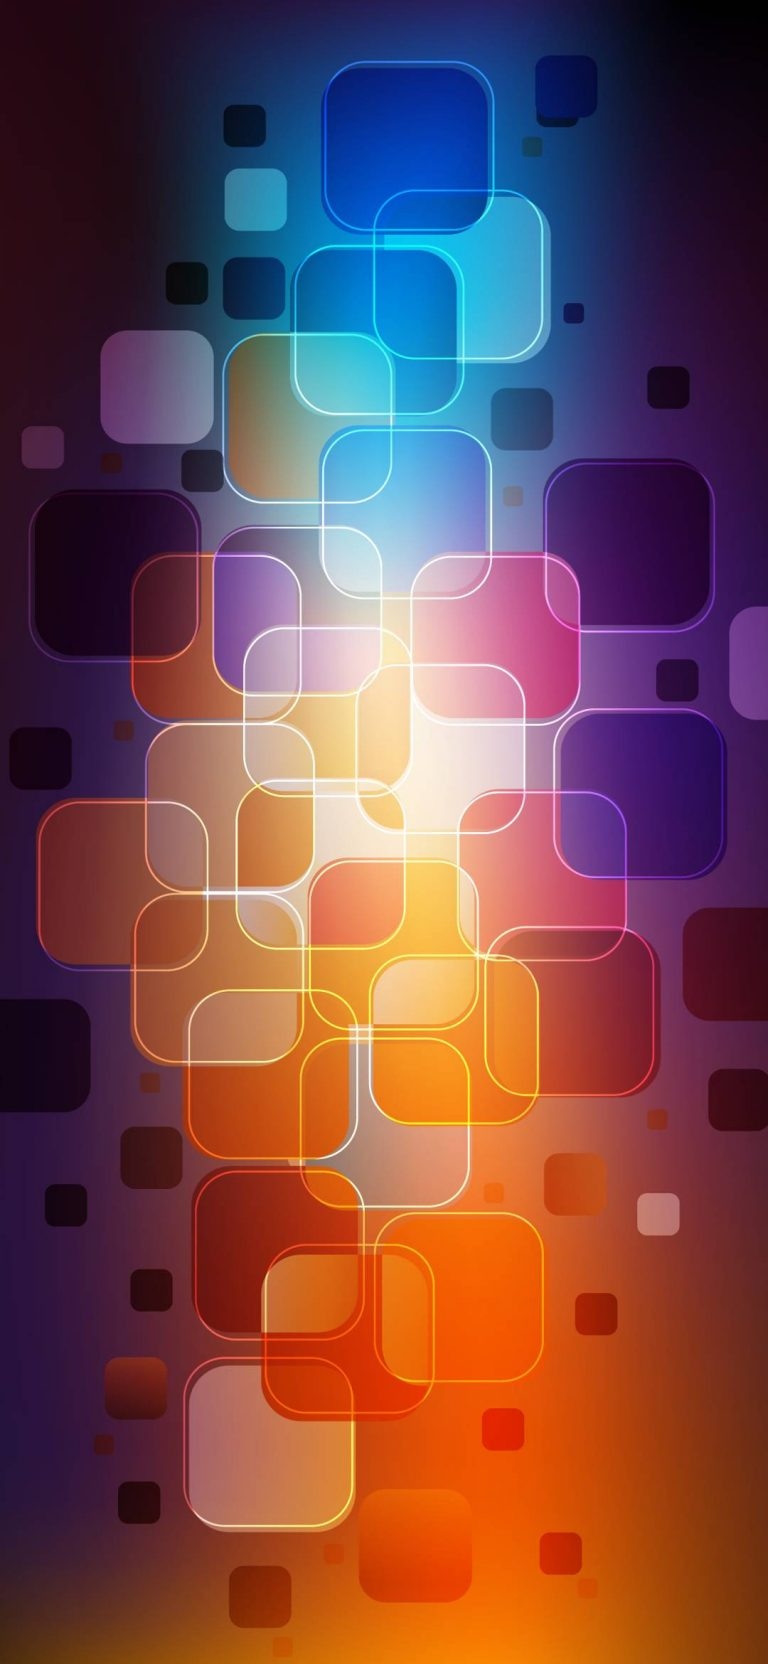 WhatsApp Background Wallpaper 72 768x1664 - WhatsApp Background Wallpaper - 72